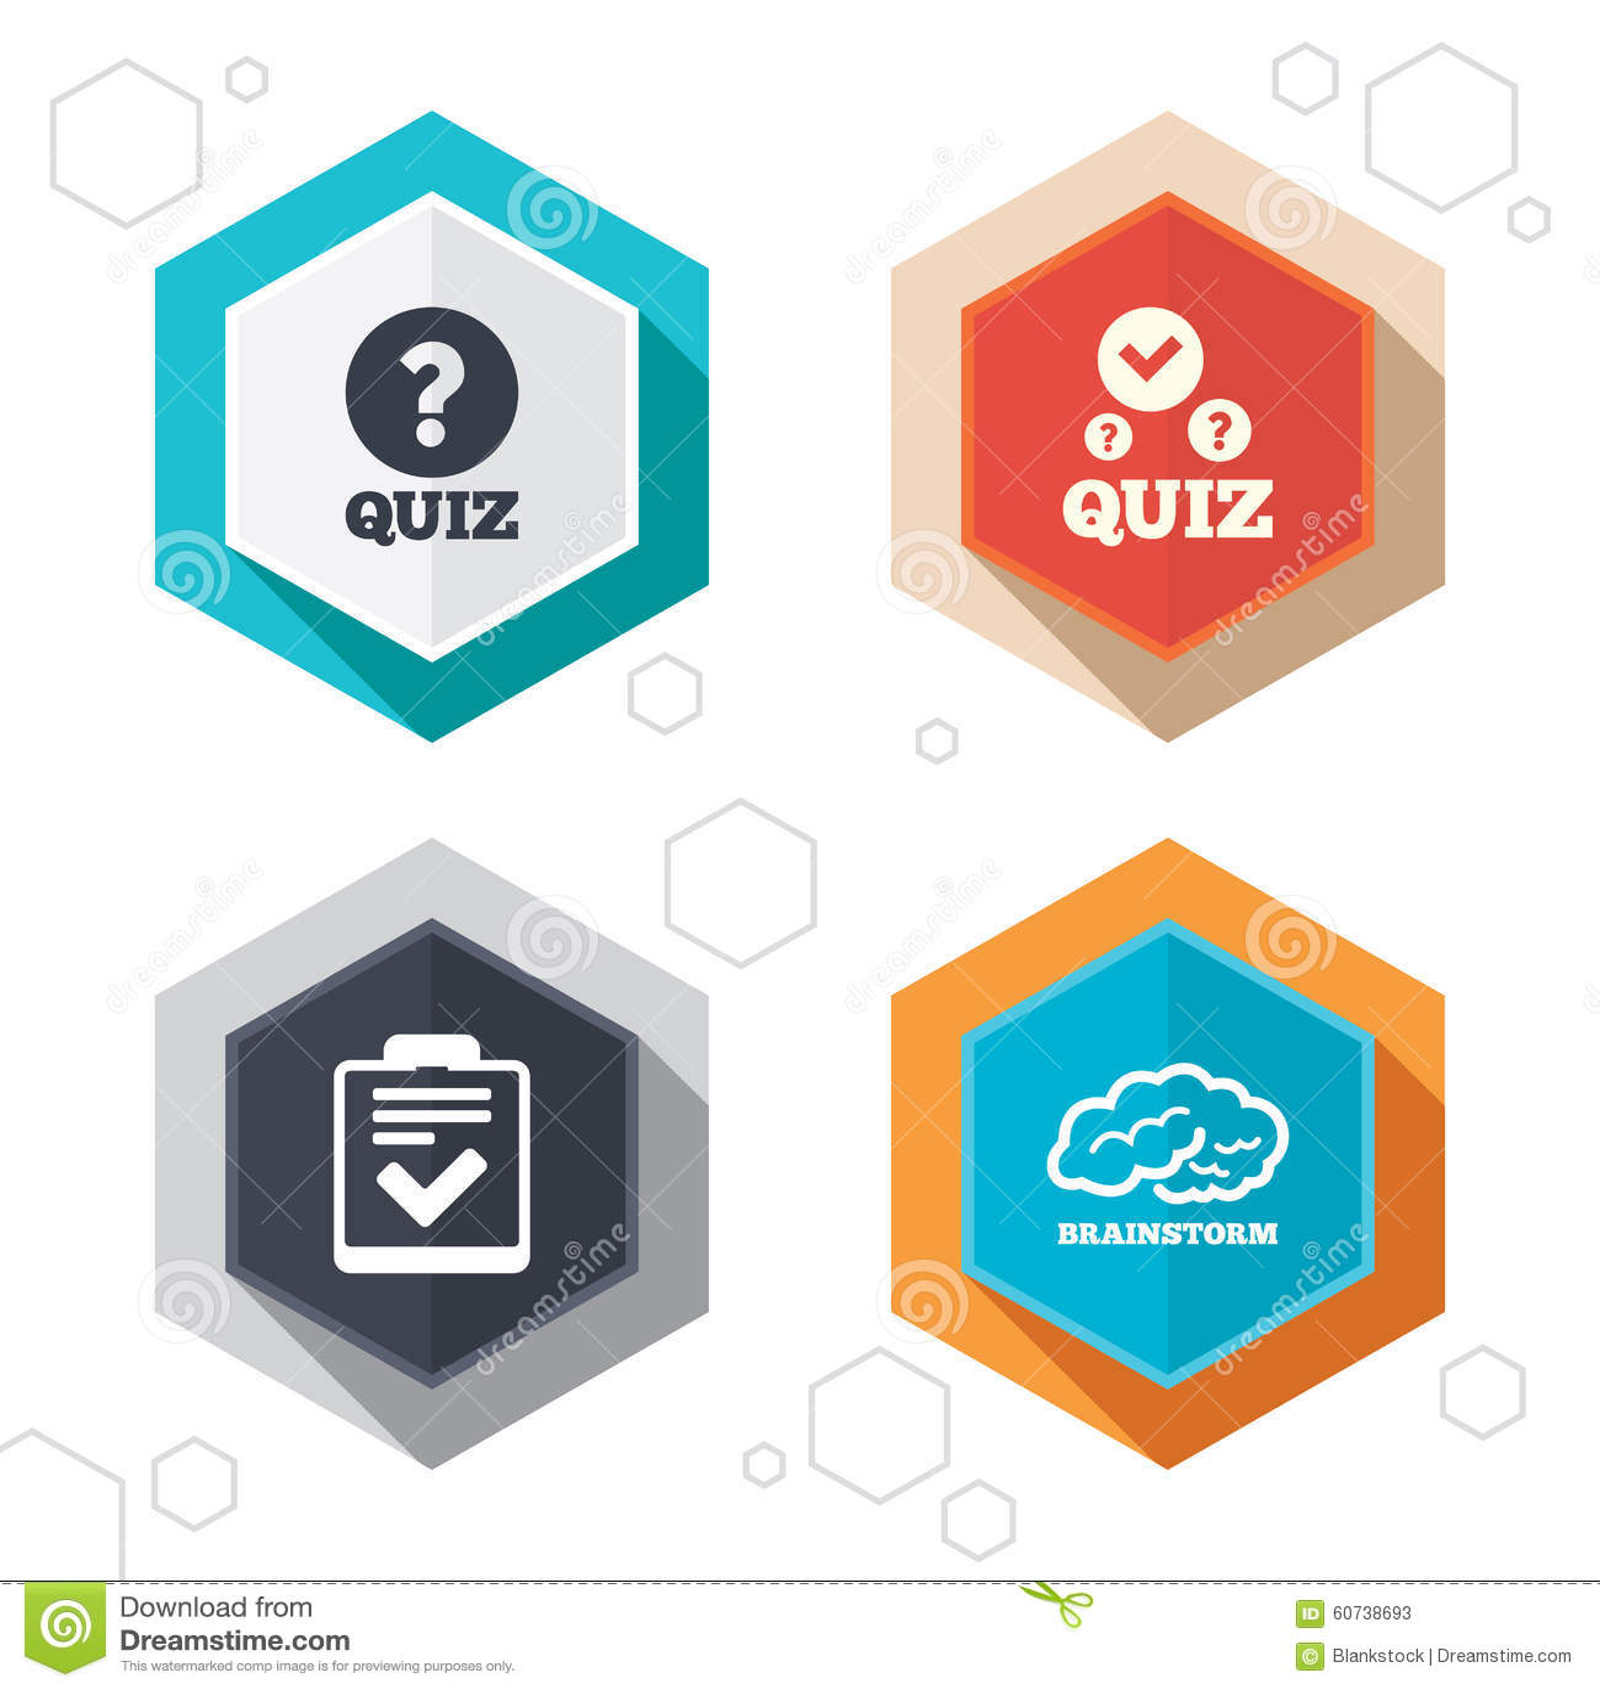 Quiz icons checklist and human brain symbols stock vector checklist and human brain symbols biocorpaavc Images